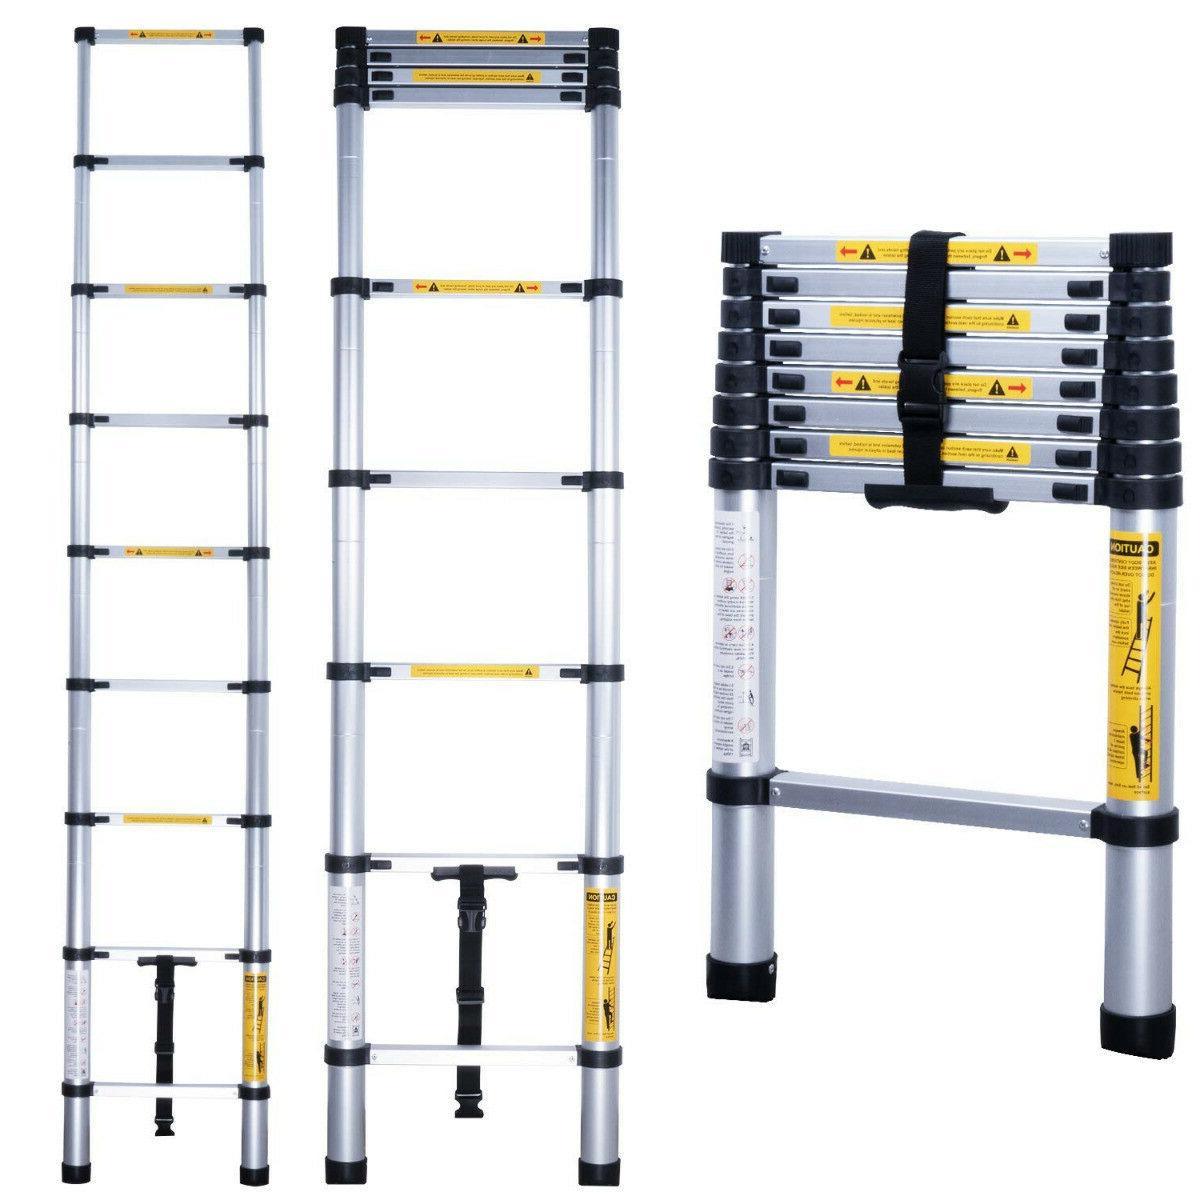 10.5/12.5/15.5/16.5 Telescopic Ladders